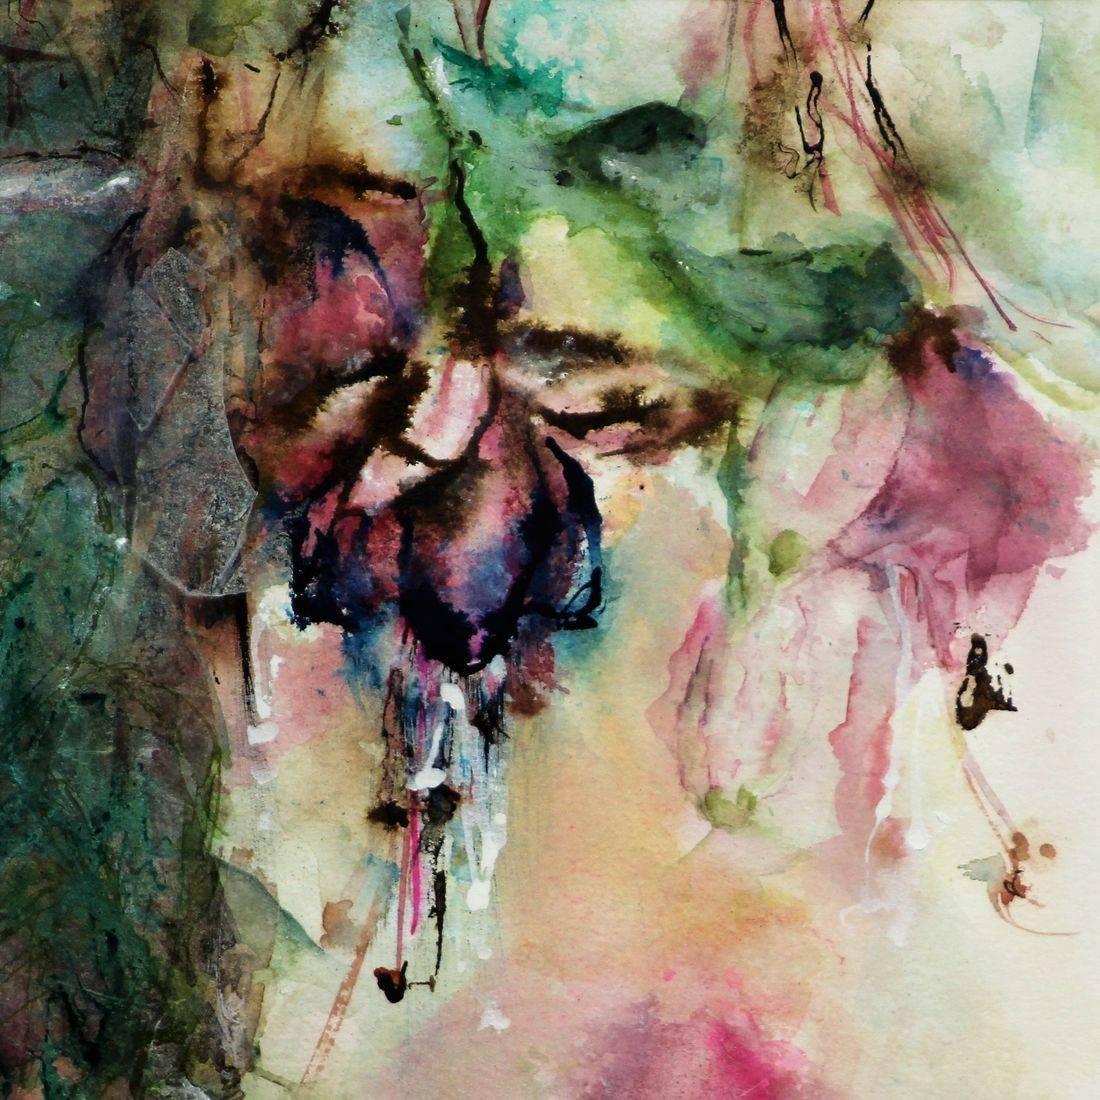 R Putbrese watercolor painting of Fushia floral.